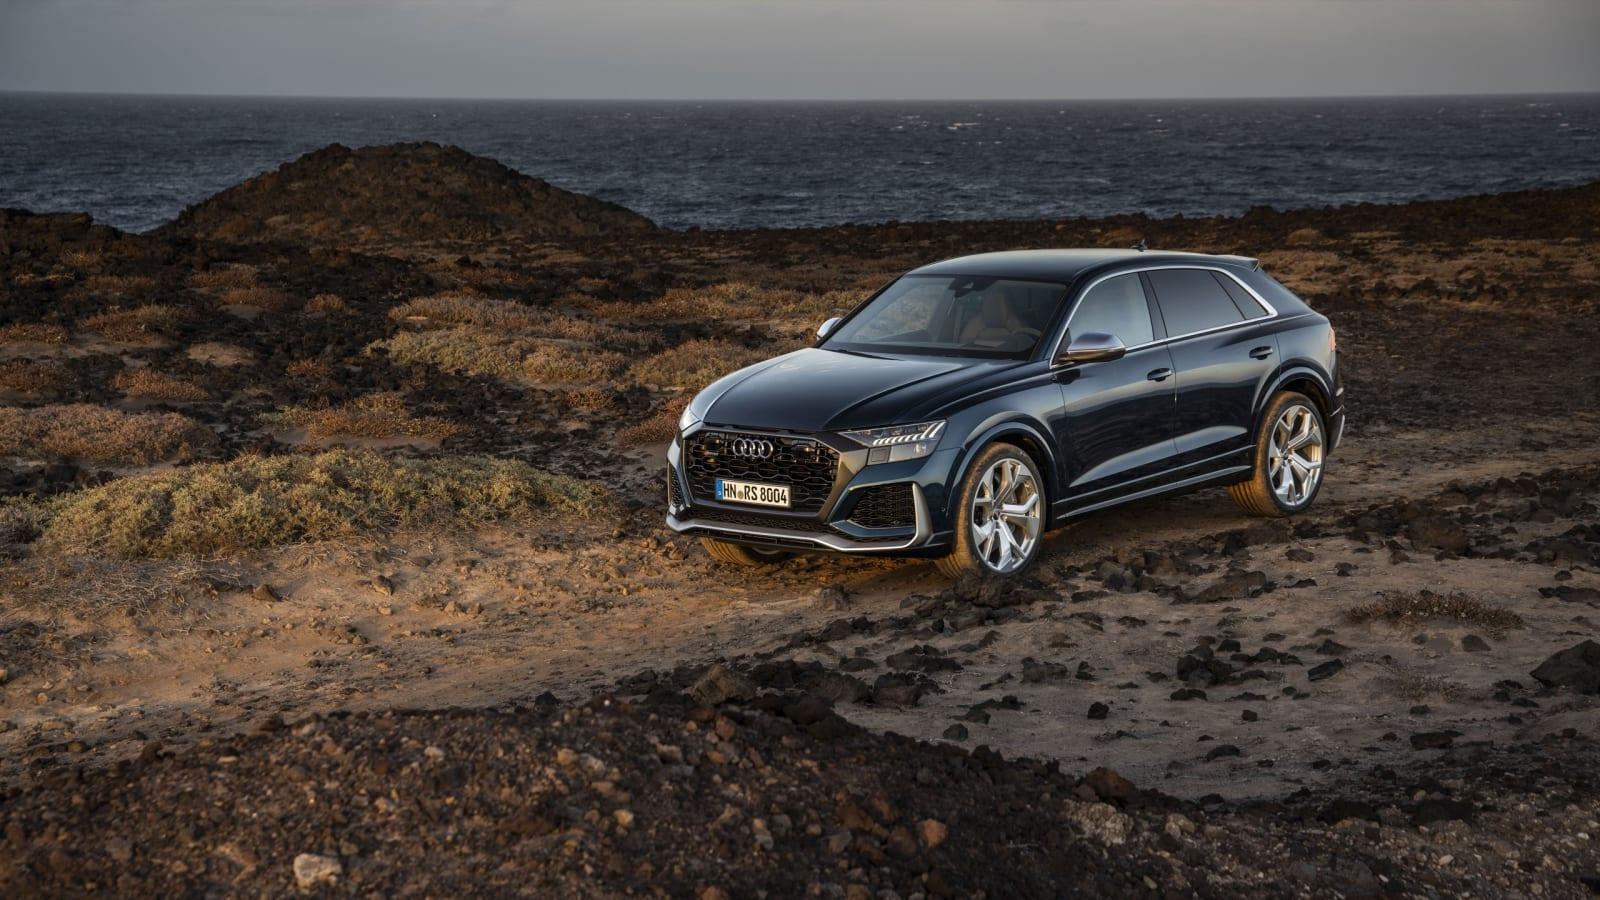 2020 Audi RS Q8 Review | Photos, specs, impressions | Autoblog